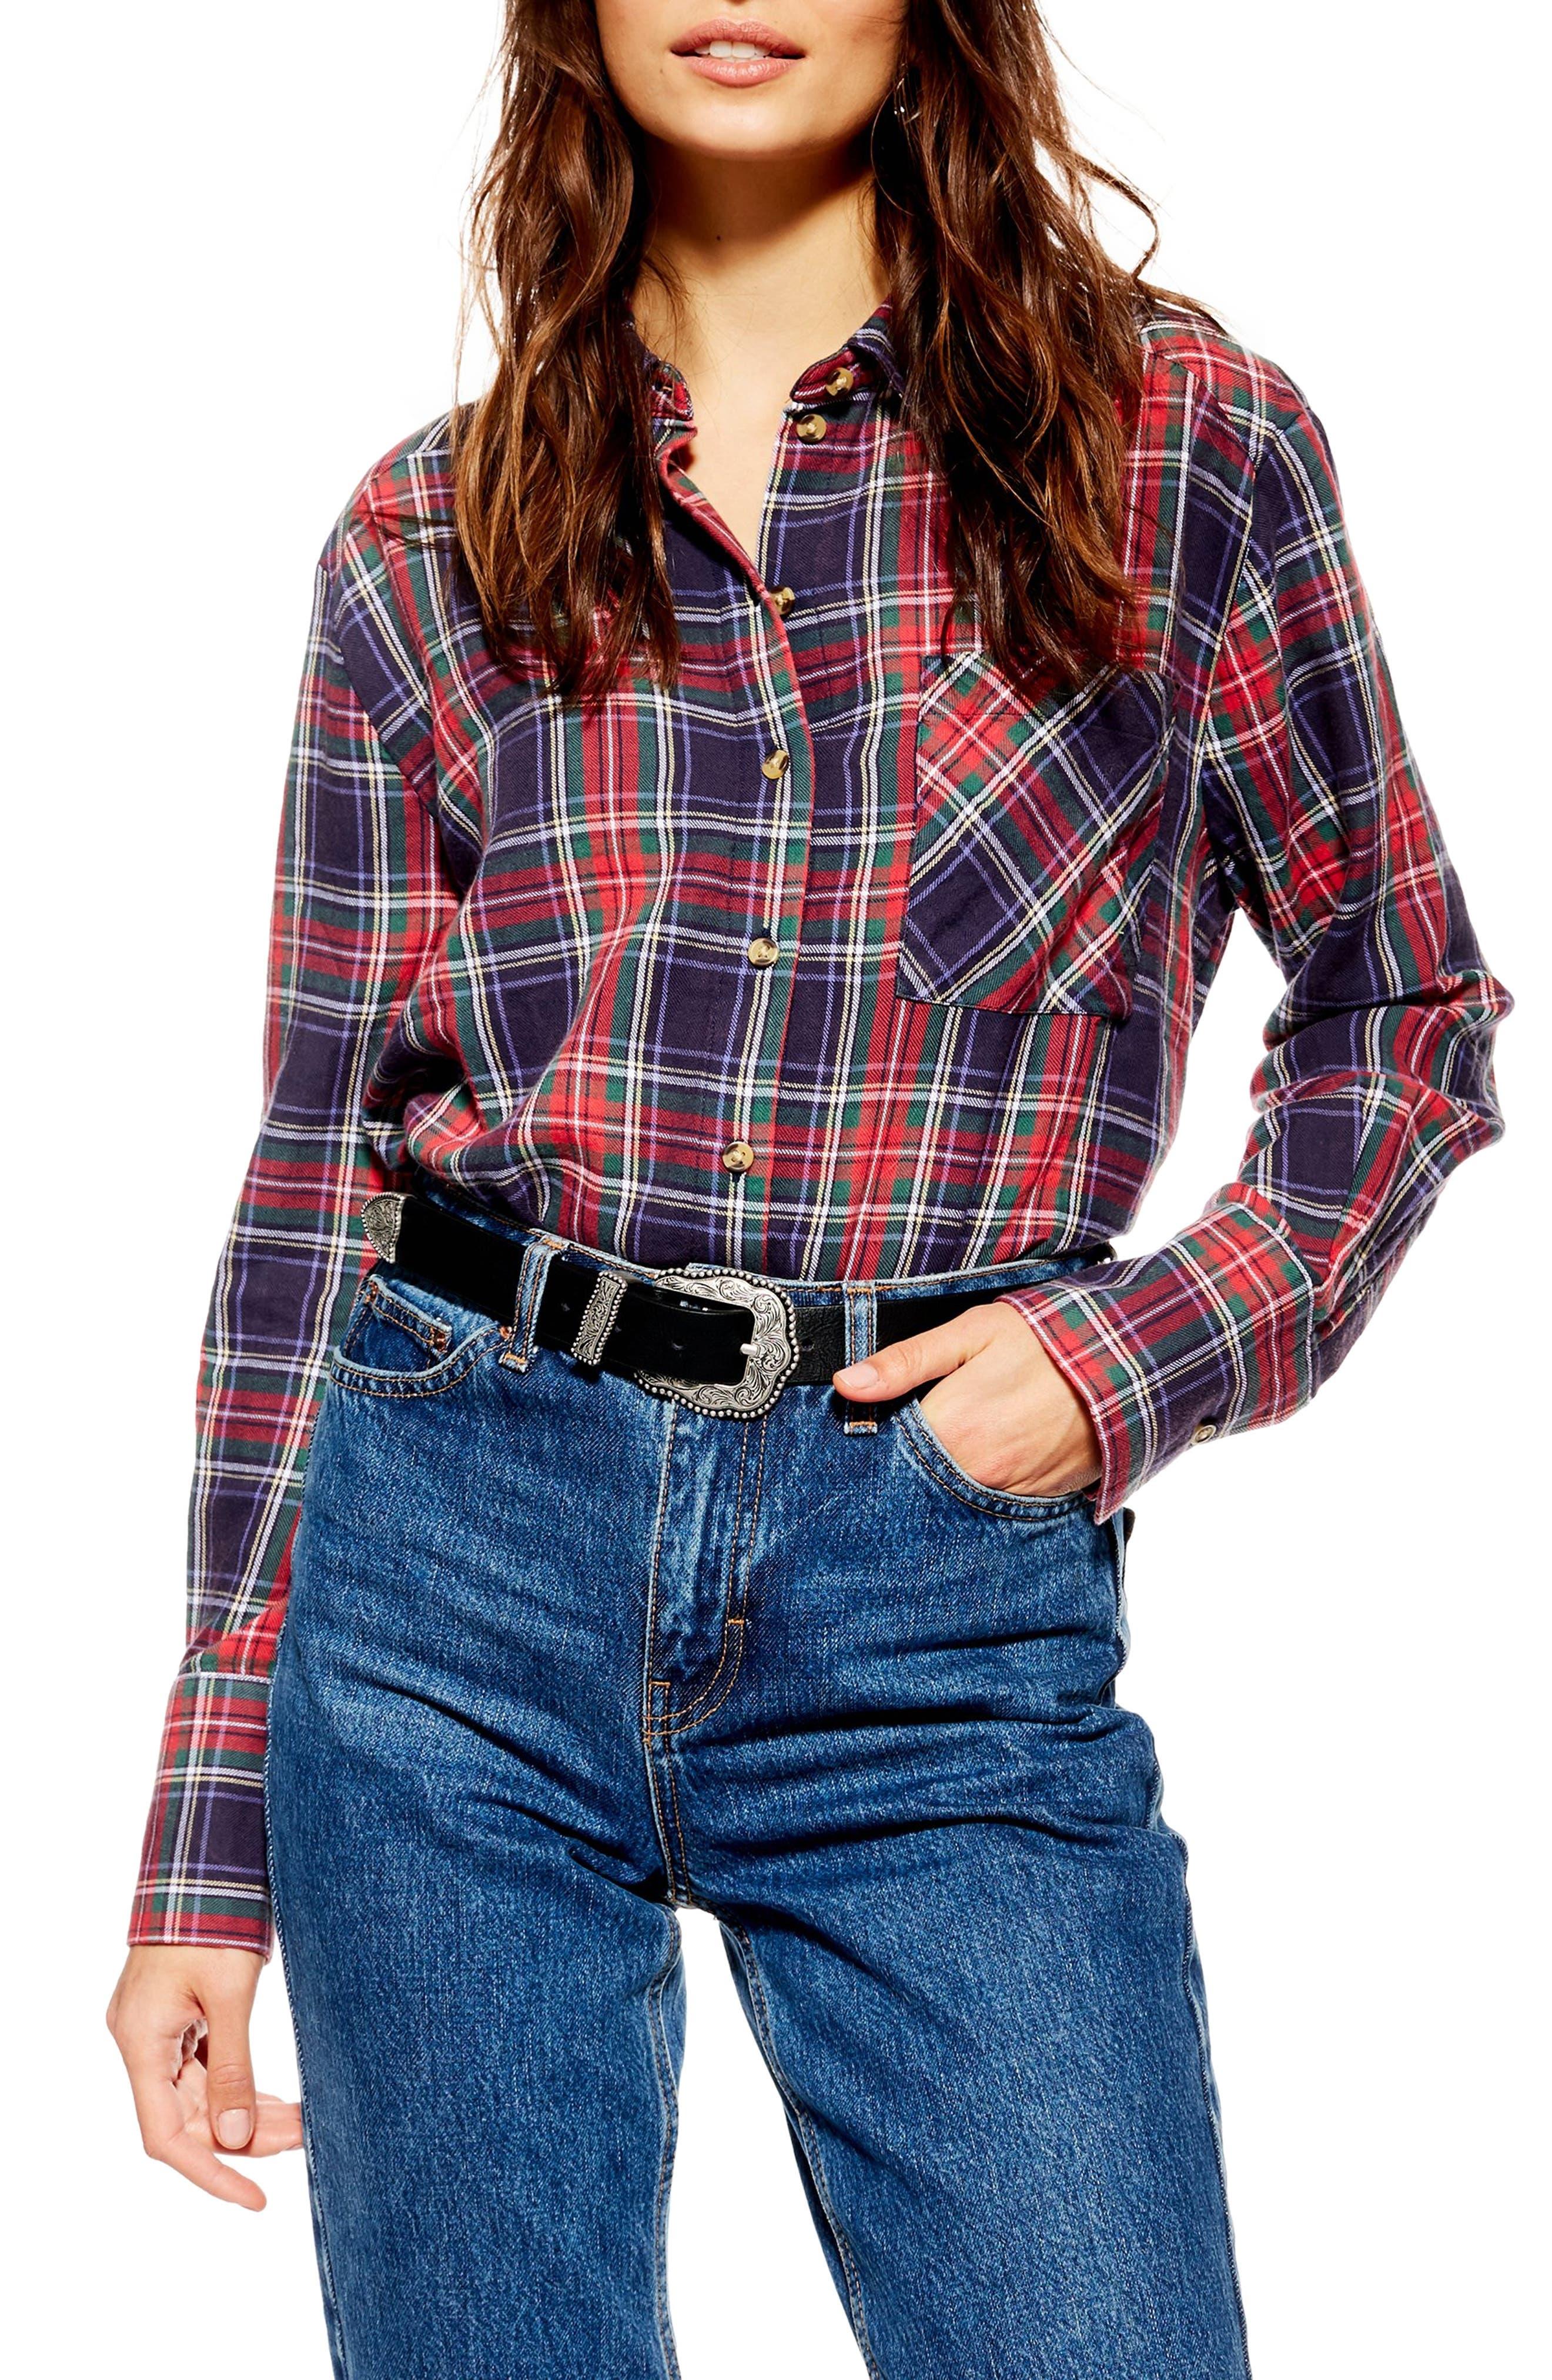 Fashion week Tartan and plaid shirts for women for girls